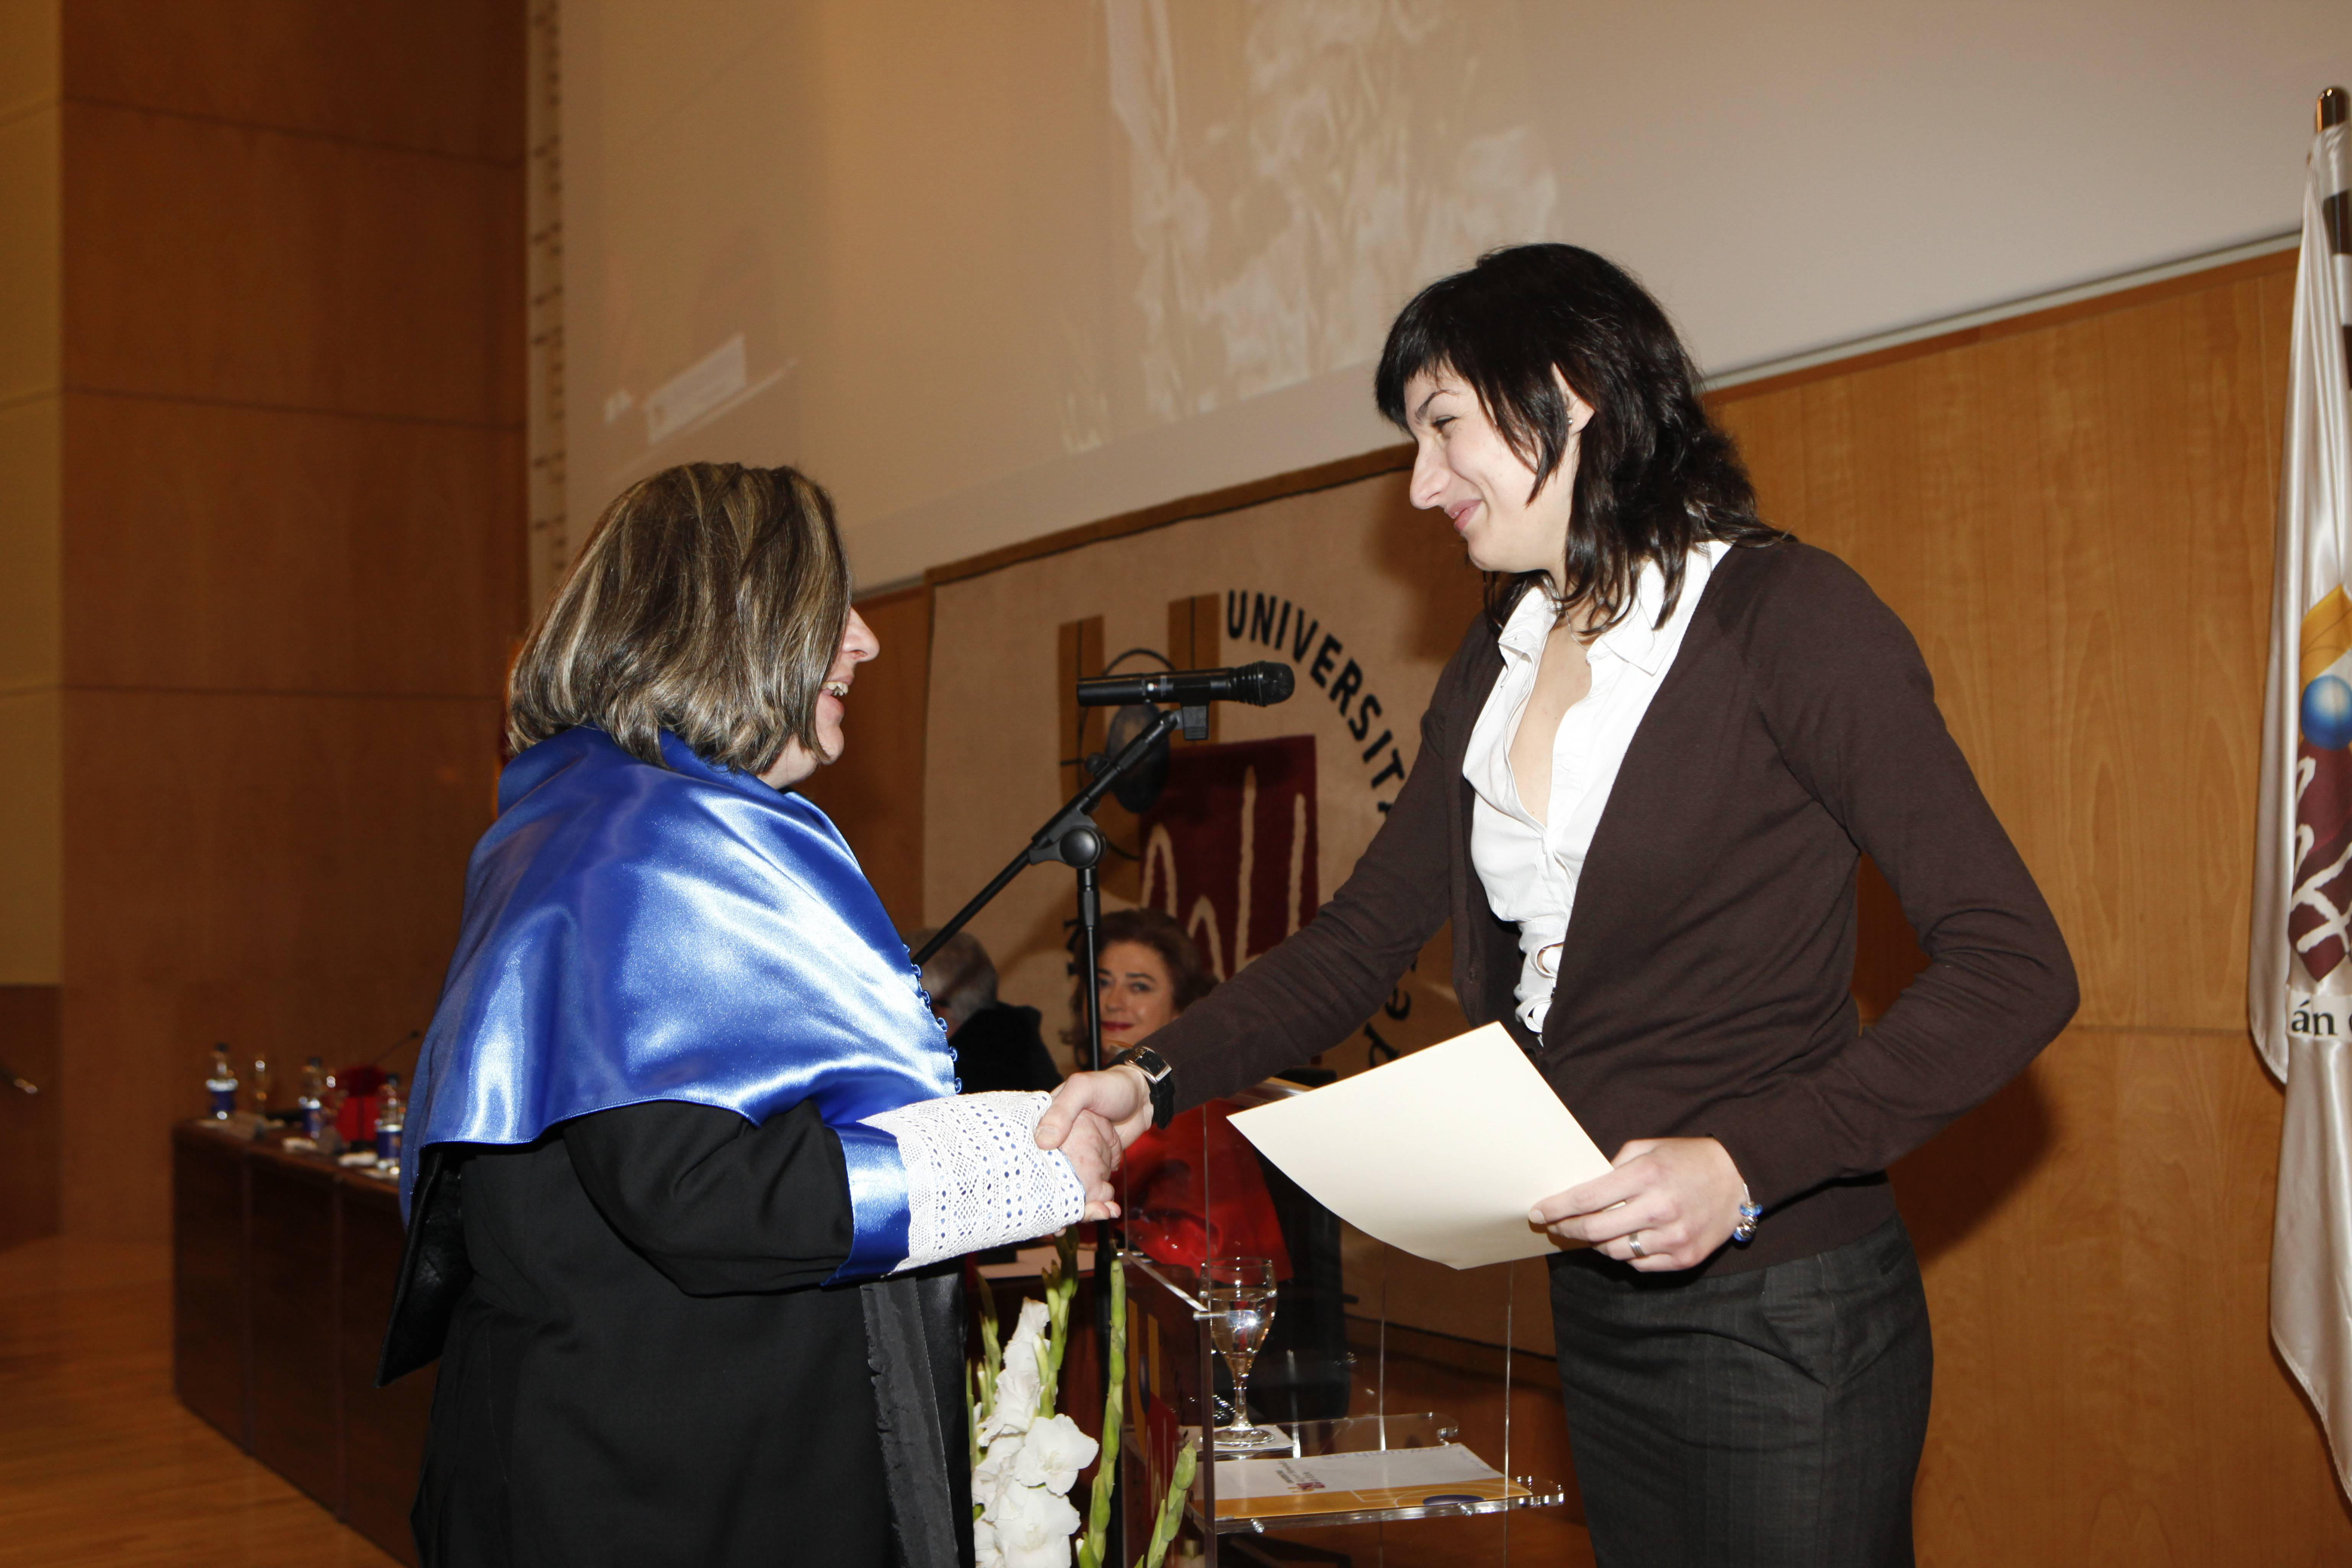 doctor-honoris-causa-luis-gamir_mg_0986.jpg